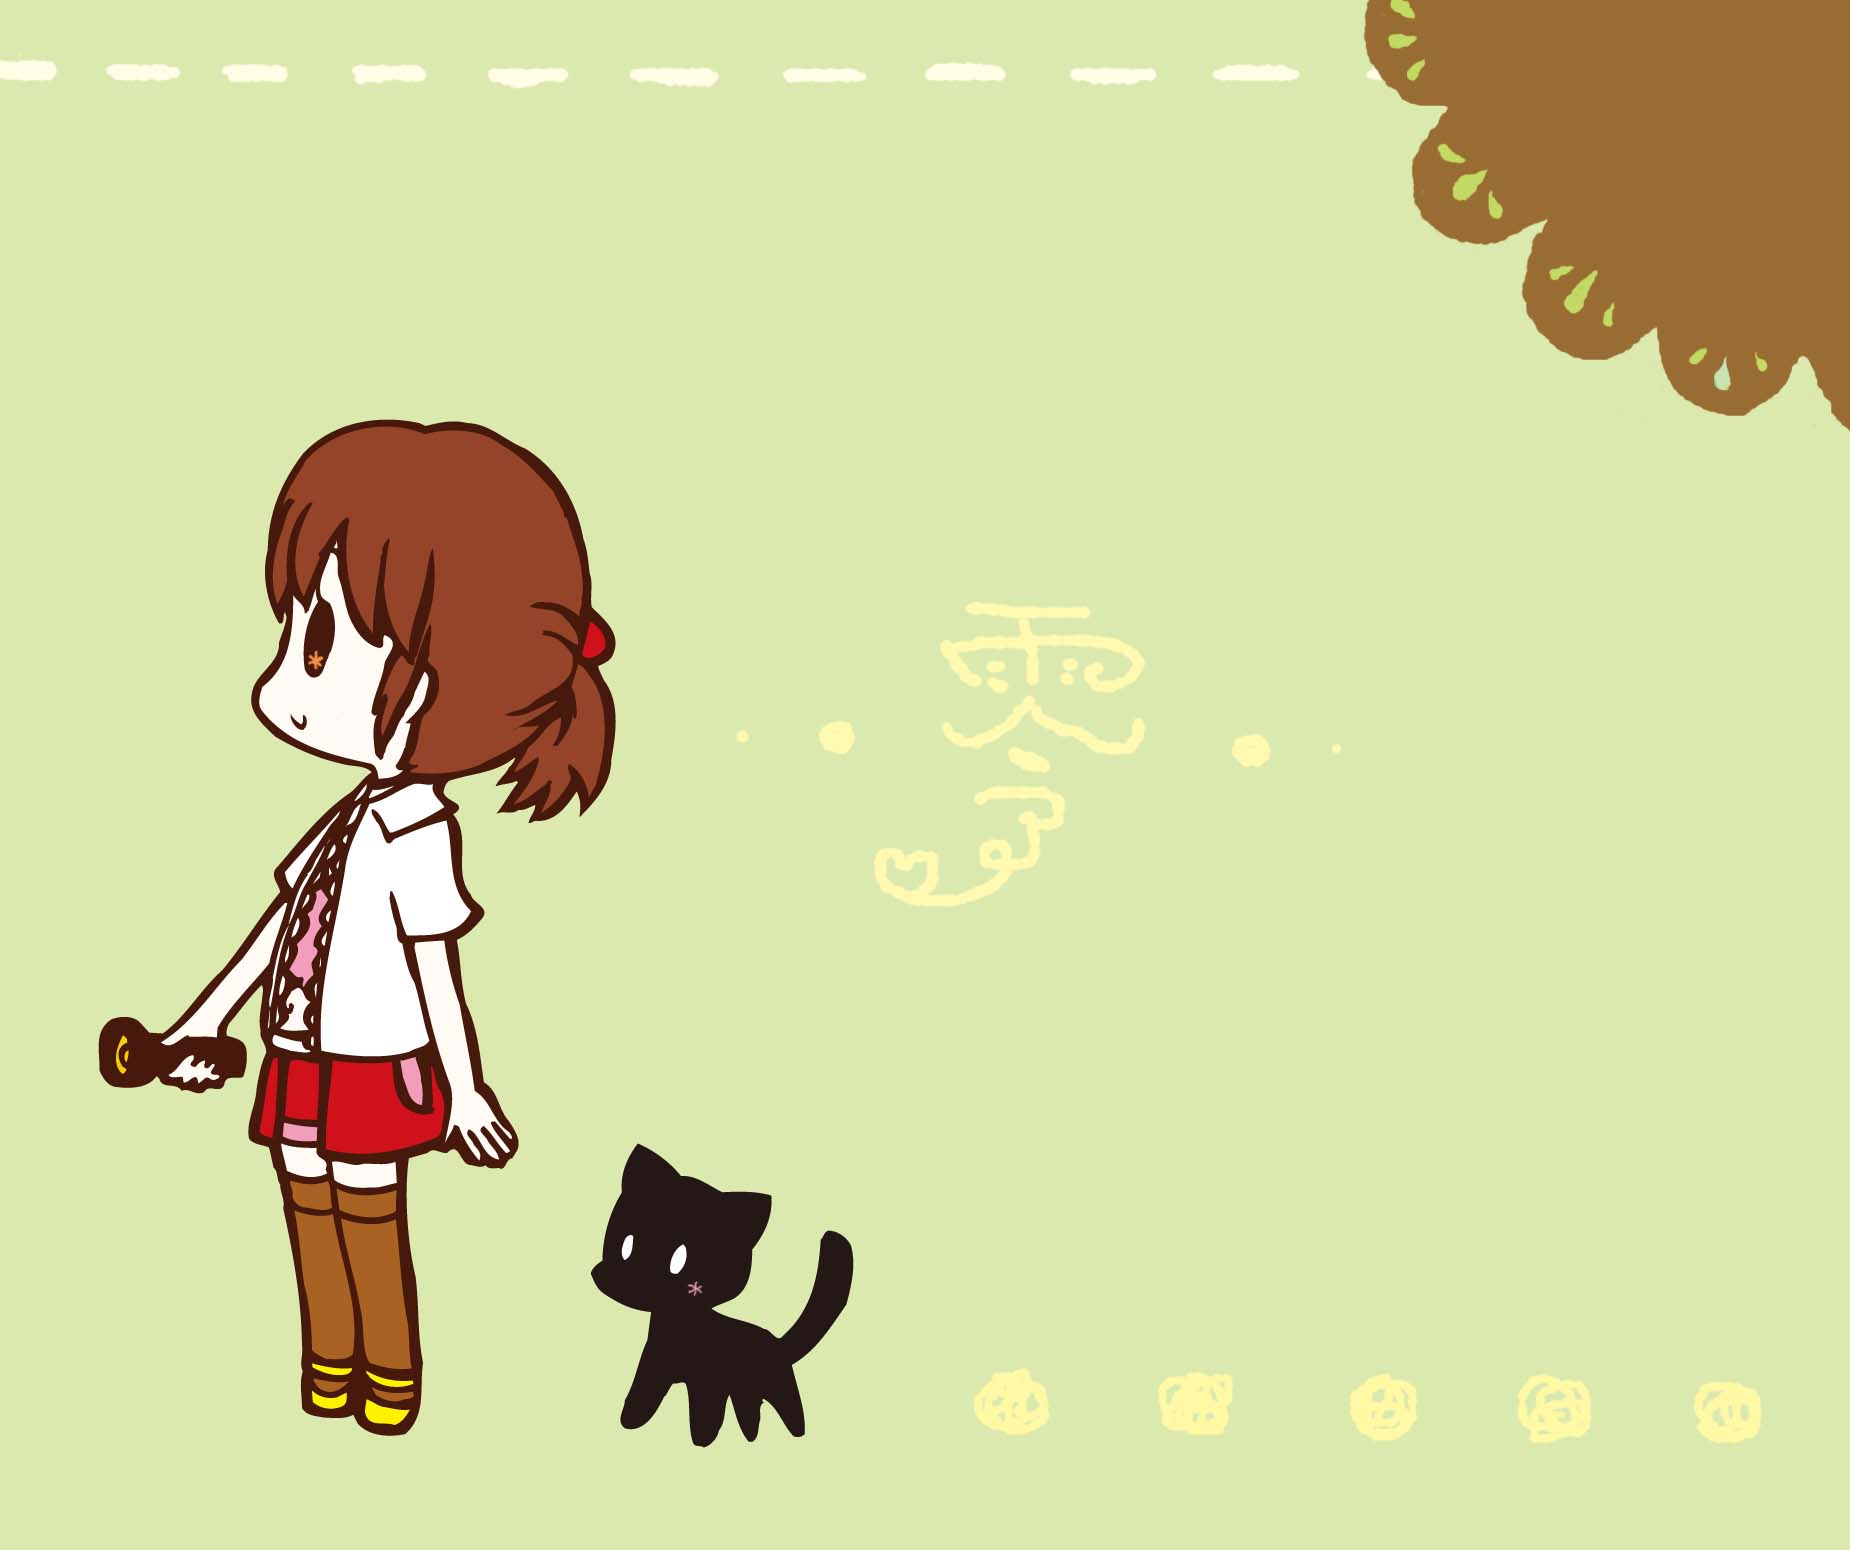 Hinasaki Miku - Fatal Frame - Image #216291 - Zerochan Anime Image Board